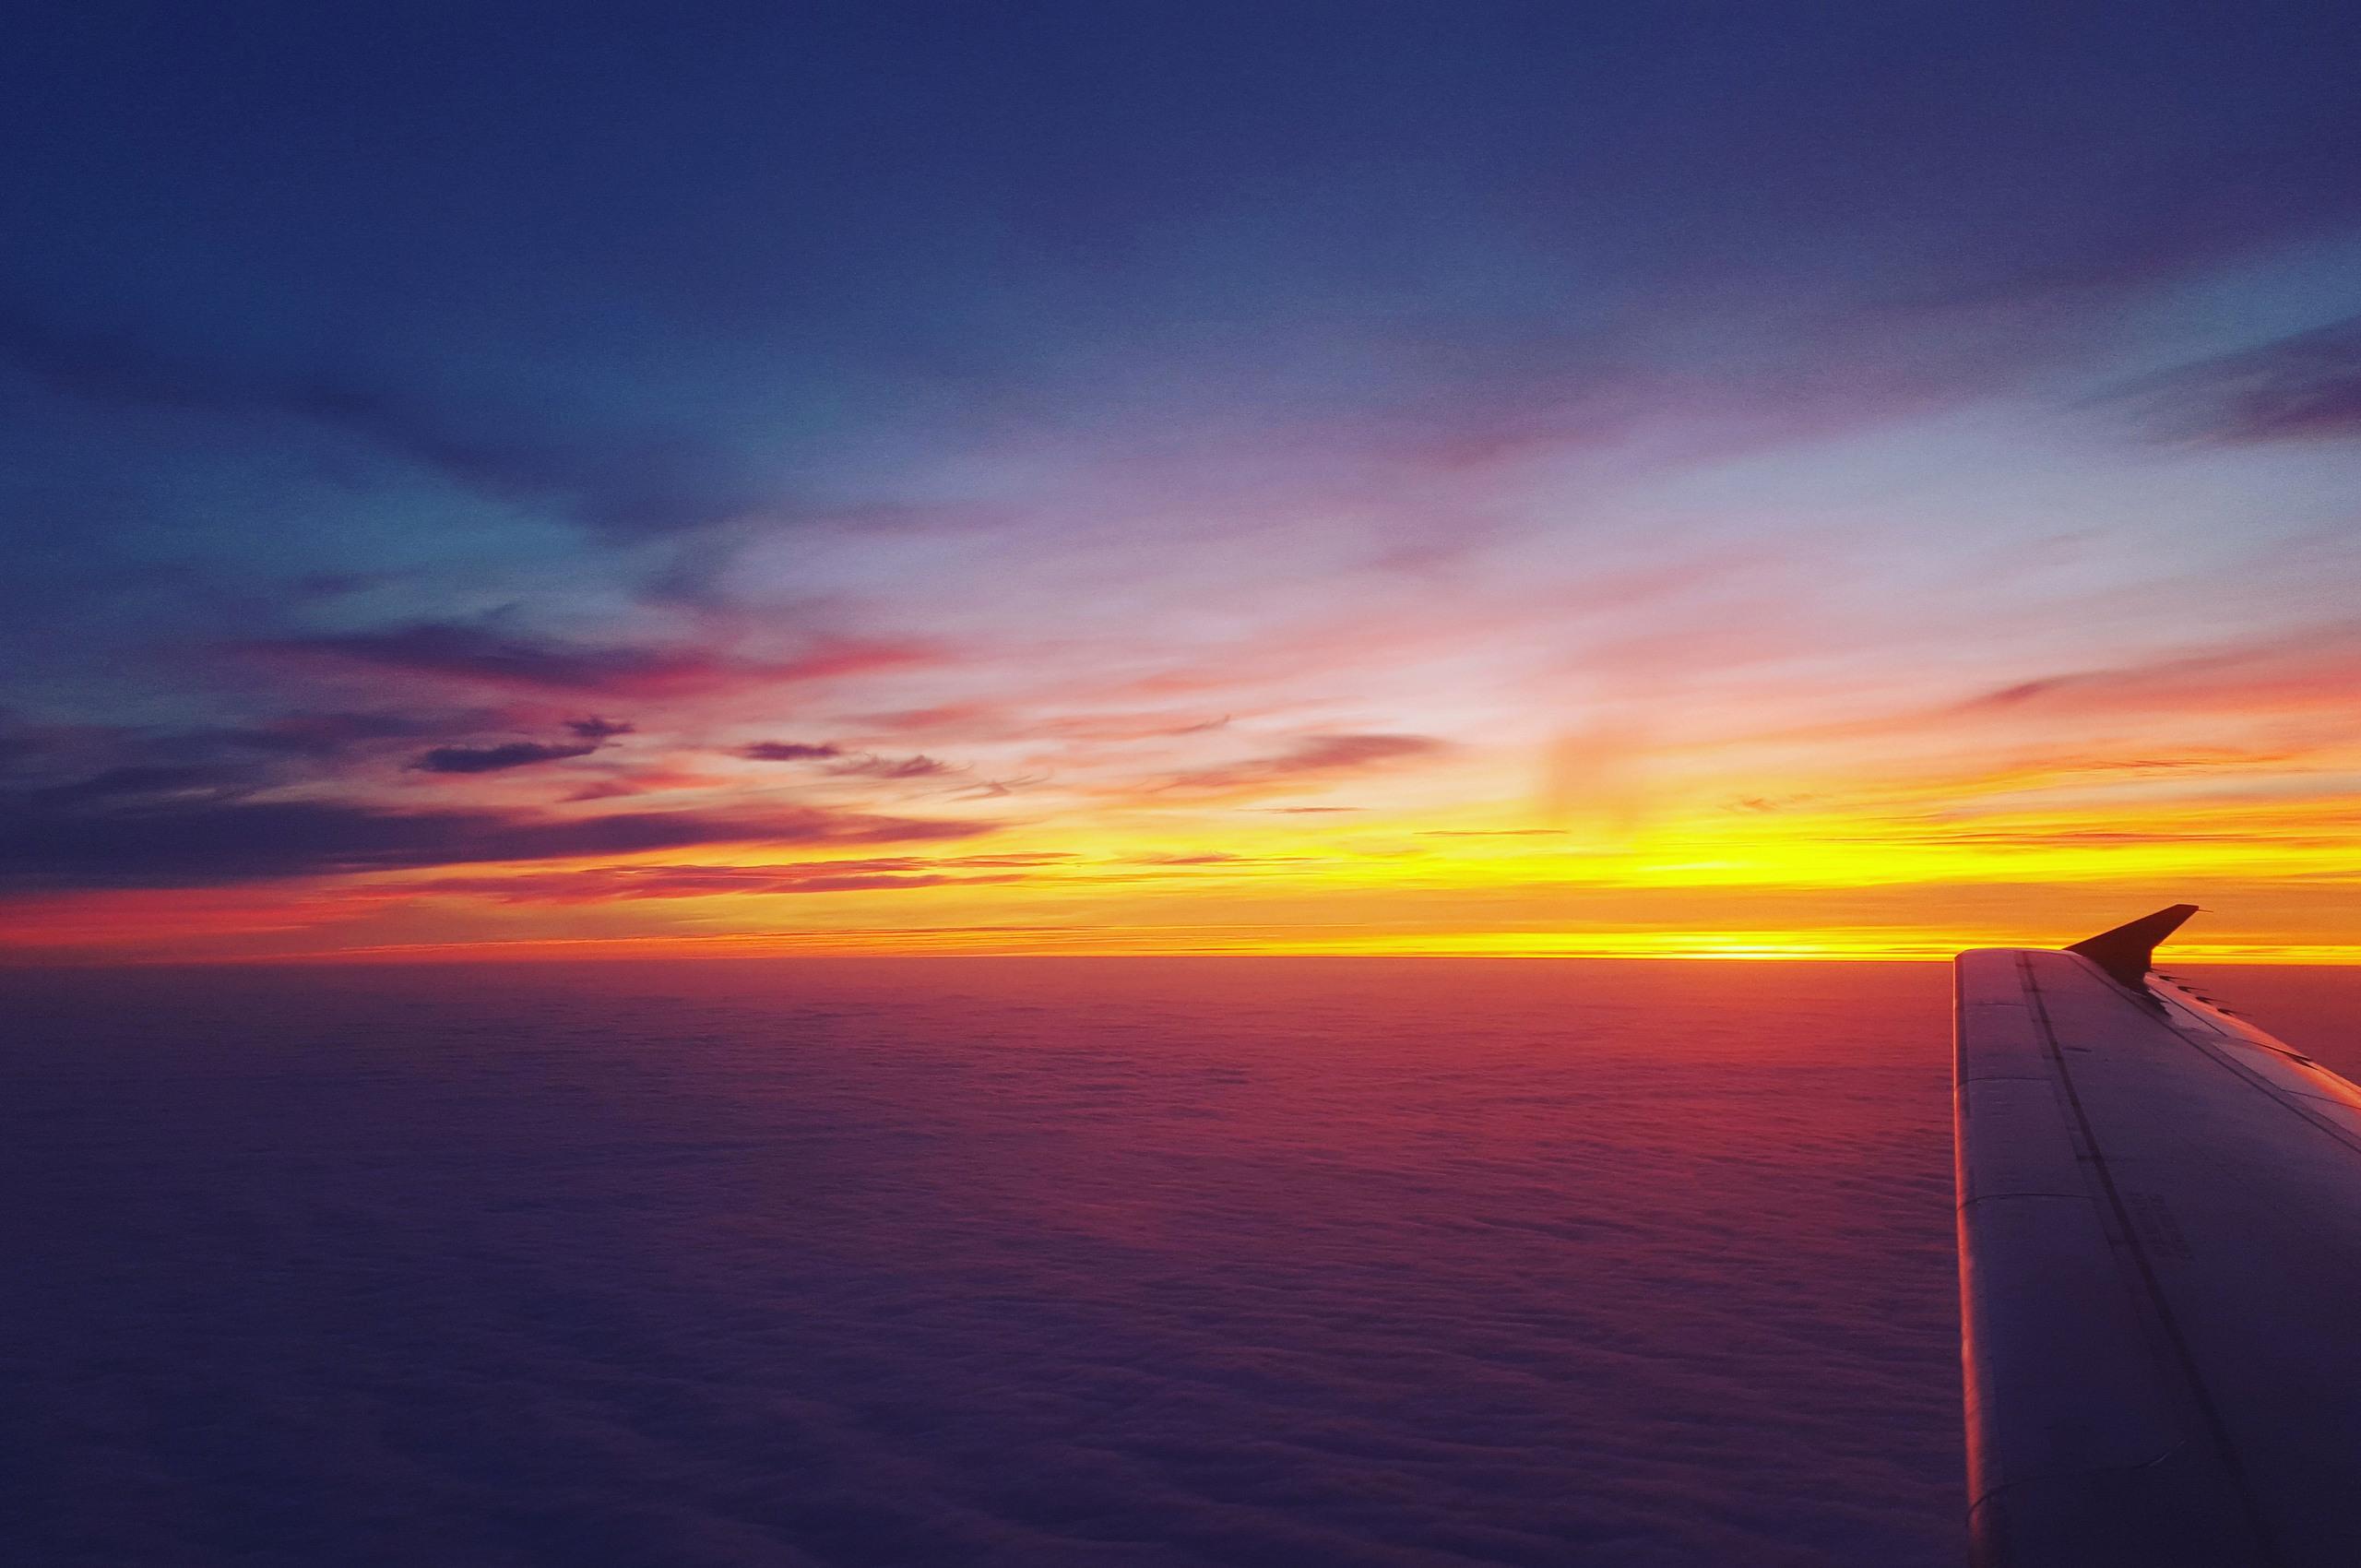 airplane-dawn-dusk-flight-sunrise-sky-24.jpg